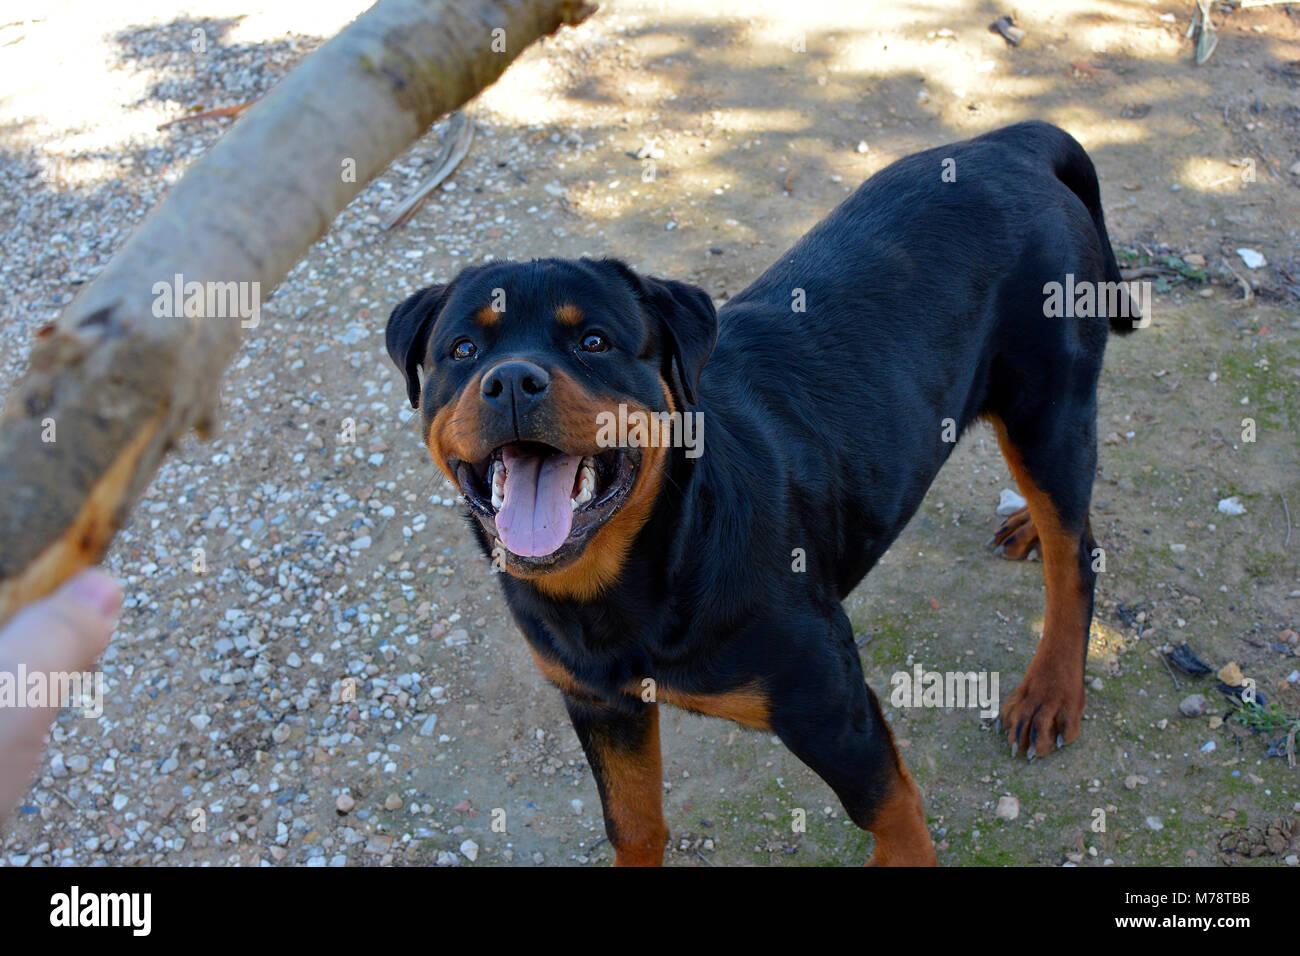 Big Puppy Stock Photos & Big Puppy Stock Images - Alamy